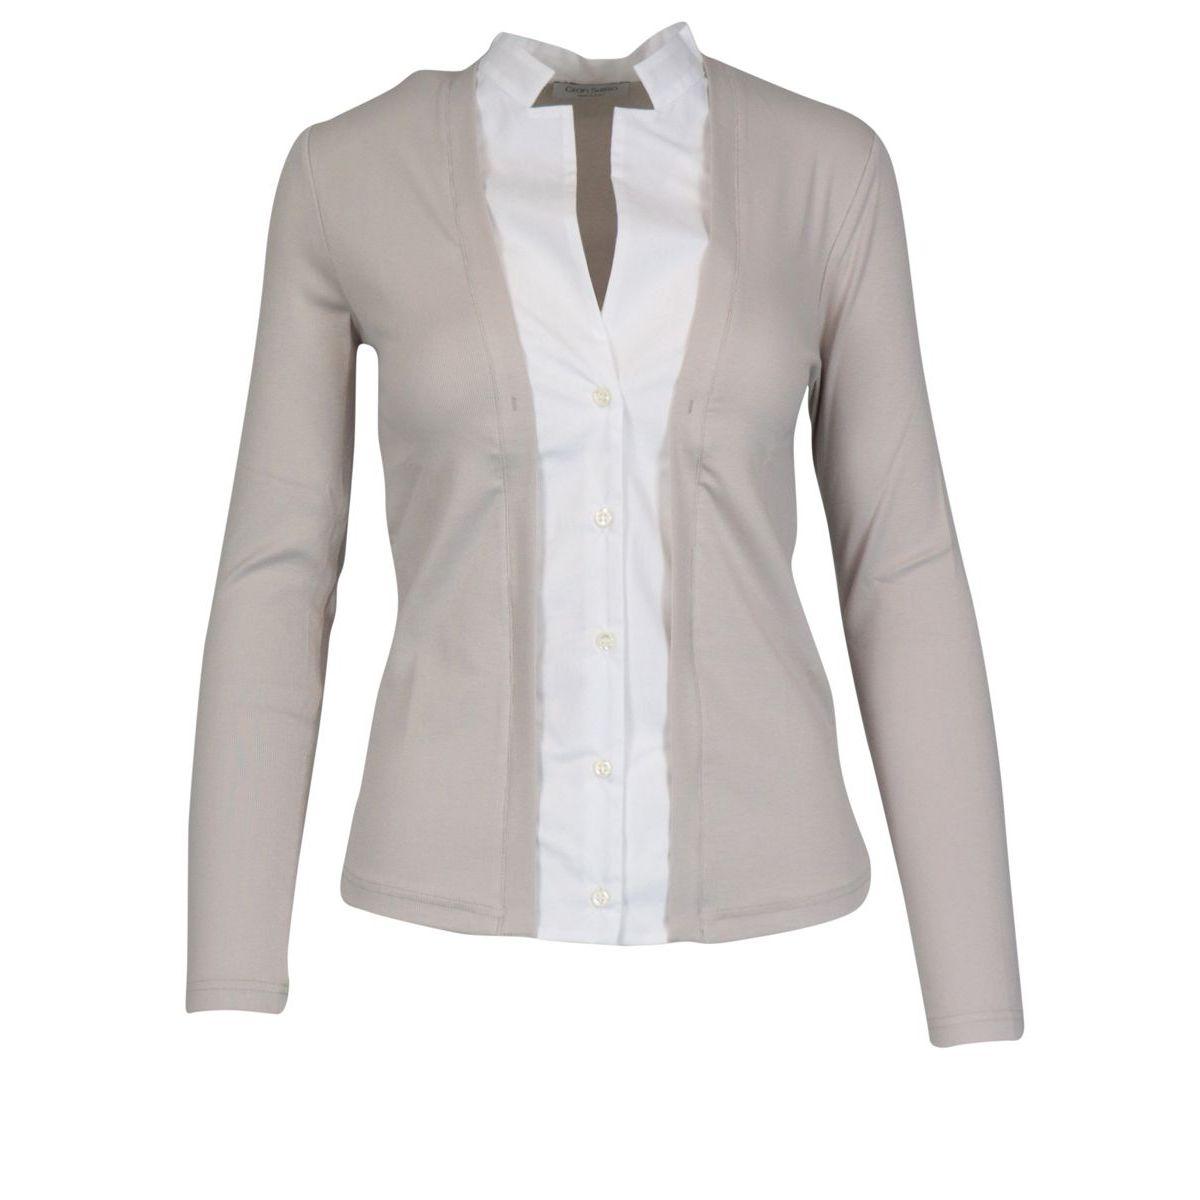 Sweater with fake shirt in stretch cotton Powder / white Gran Sasso